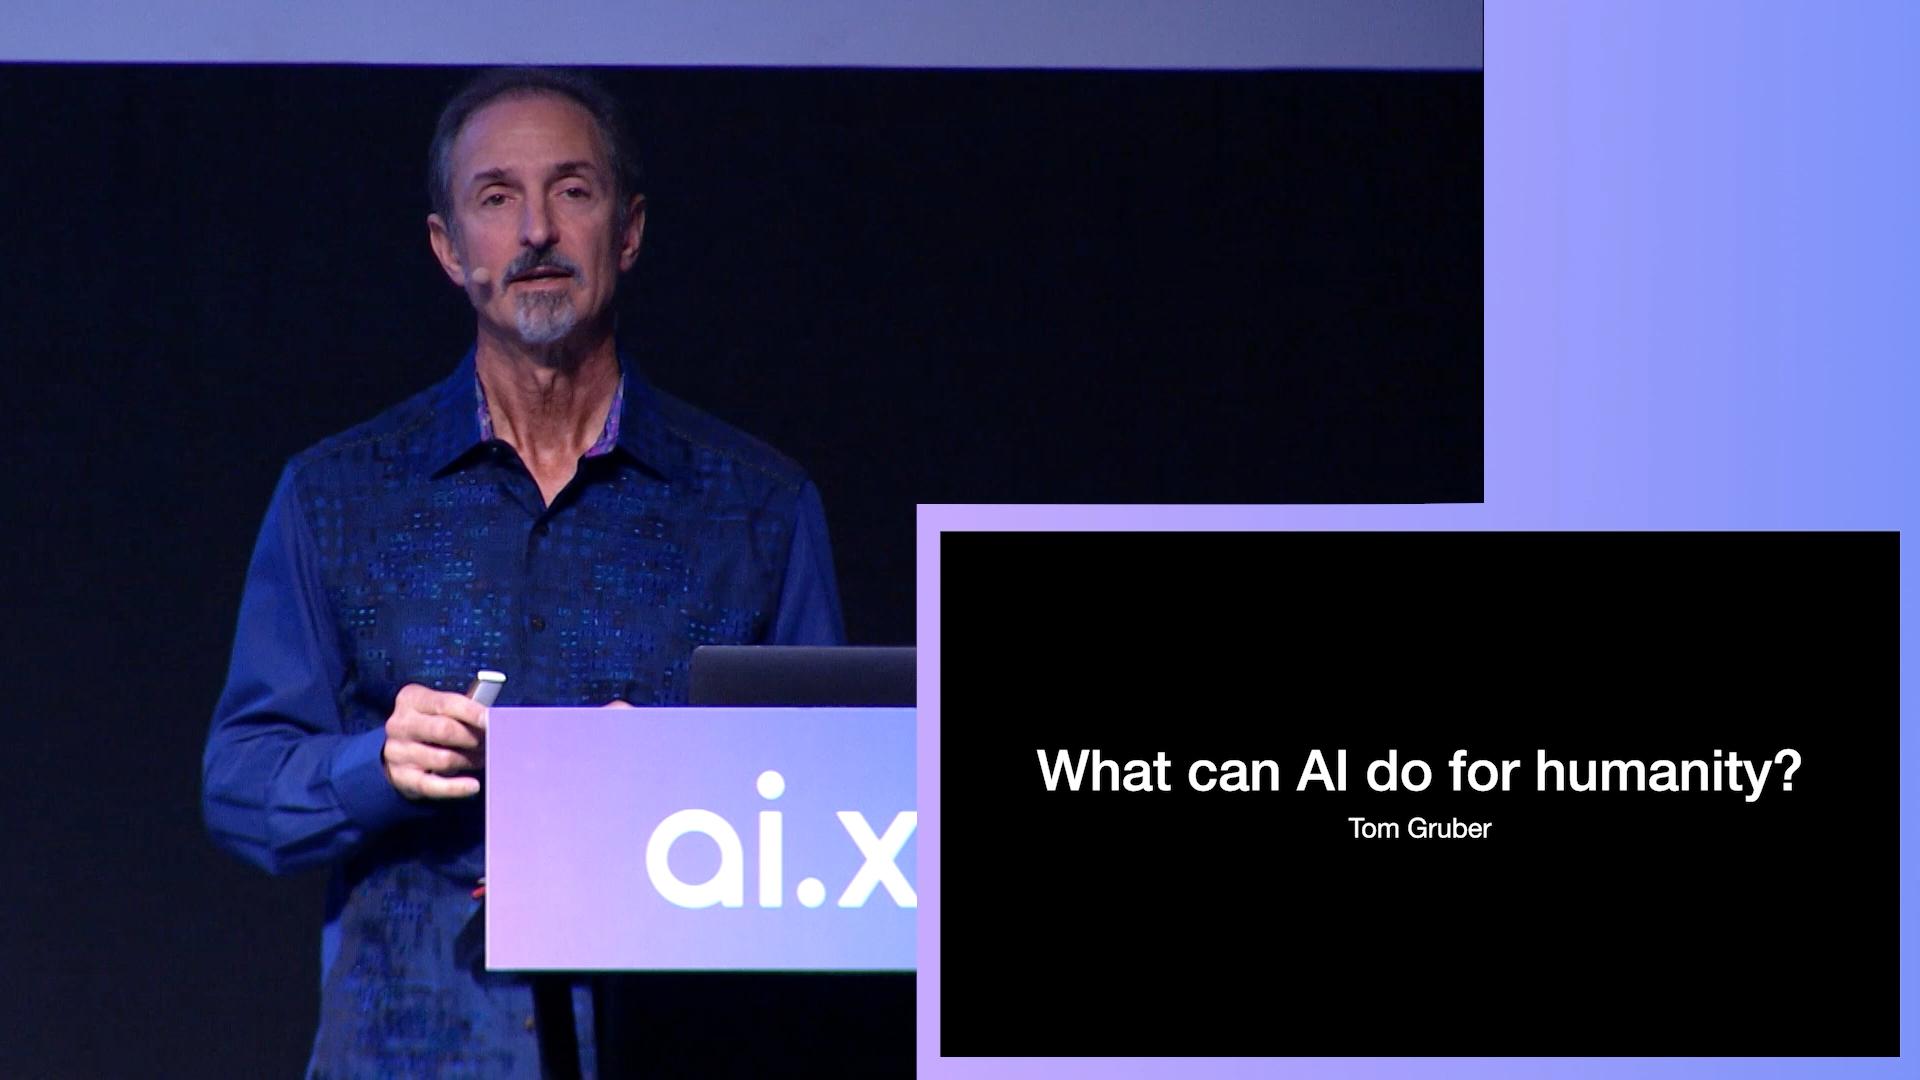 Tom Gruber at AI.x 2019